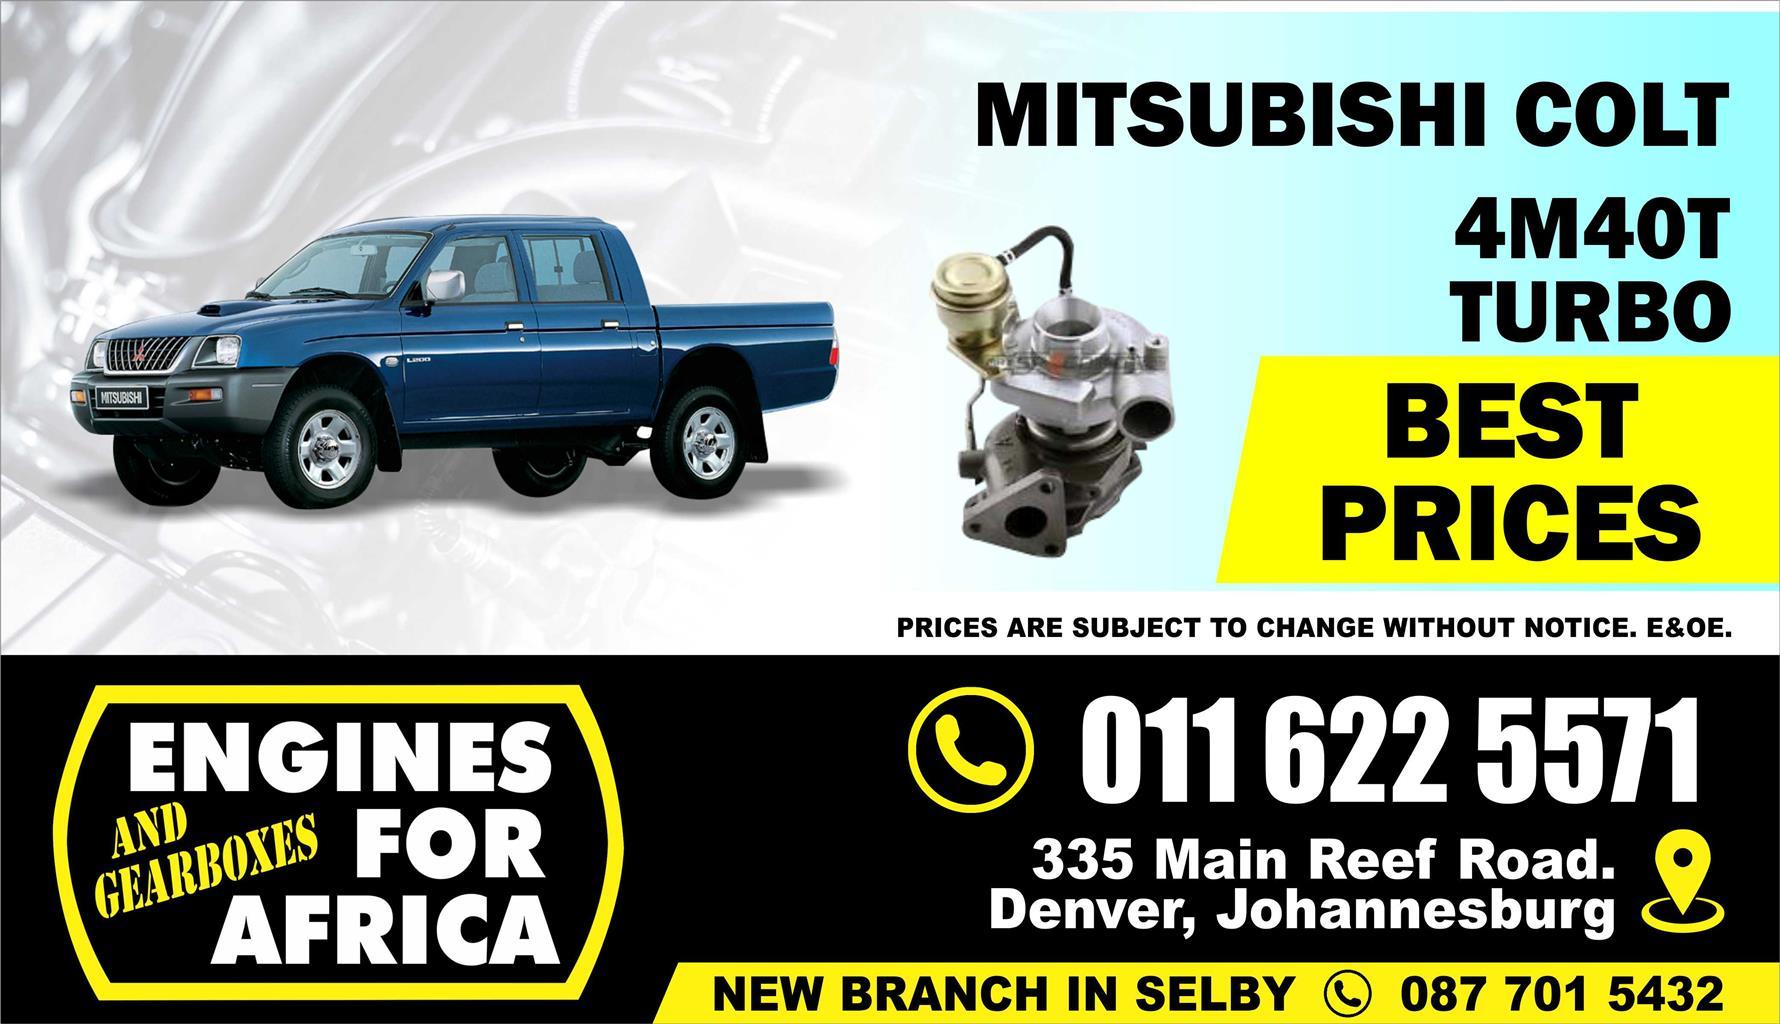 New Mitsubishi Colt 4M40 2 8Tdi Turbocharger FOR SALE